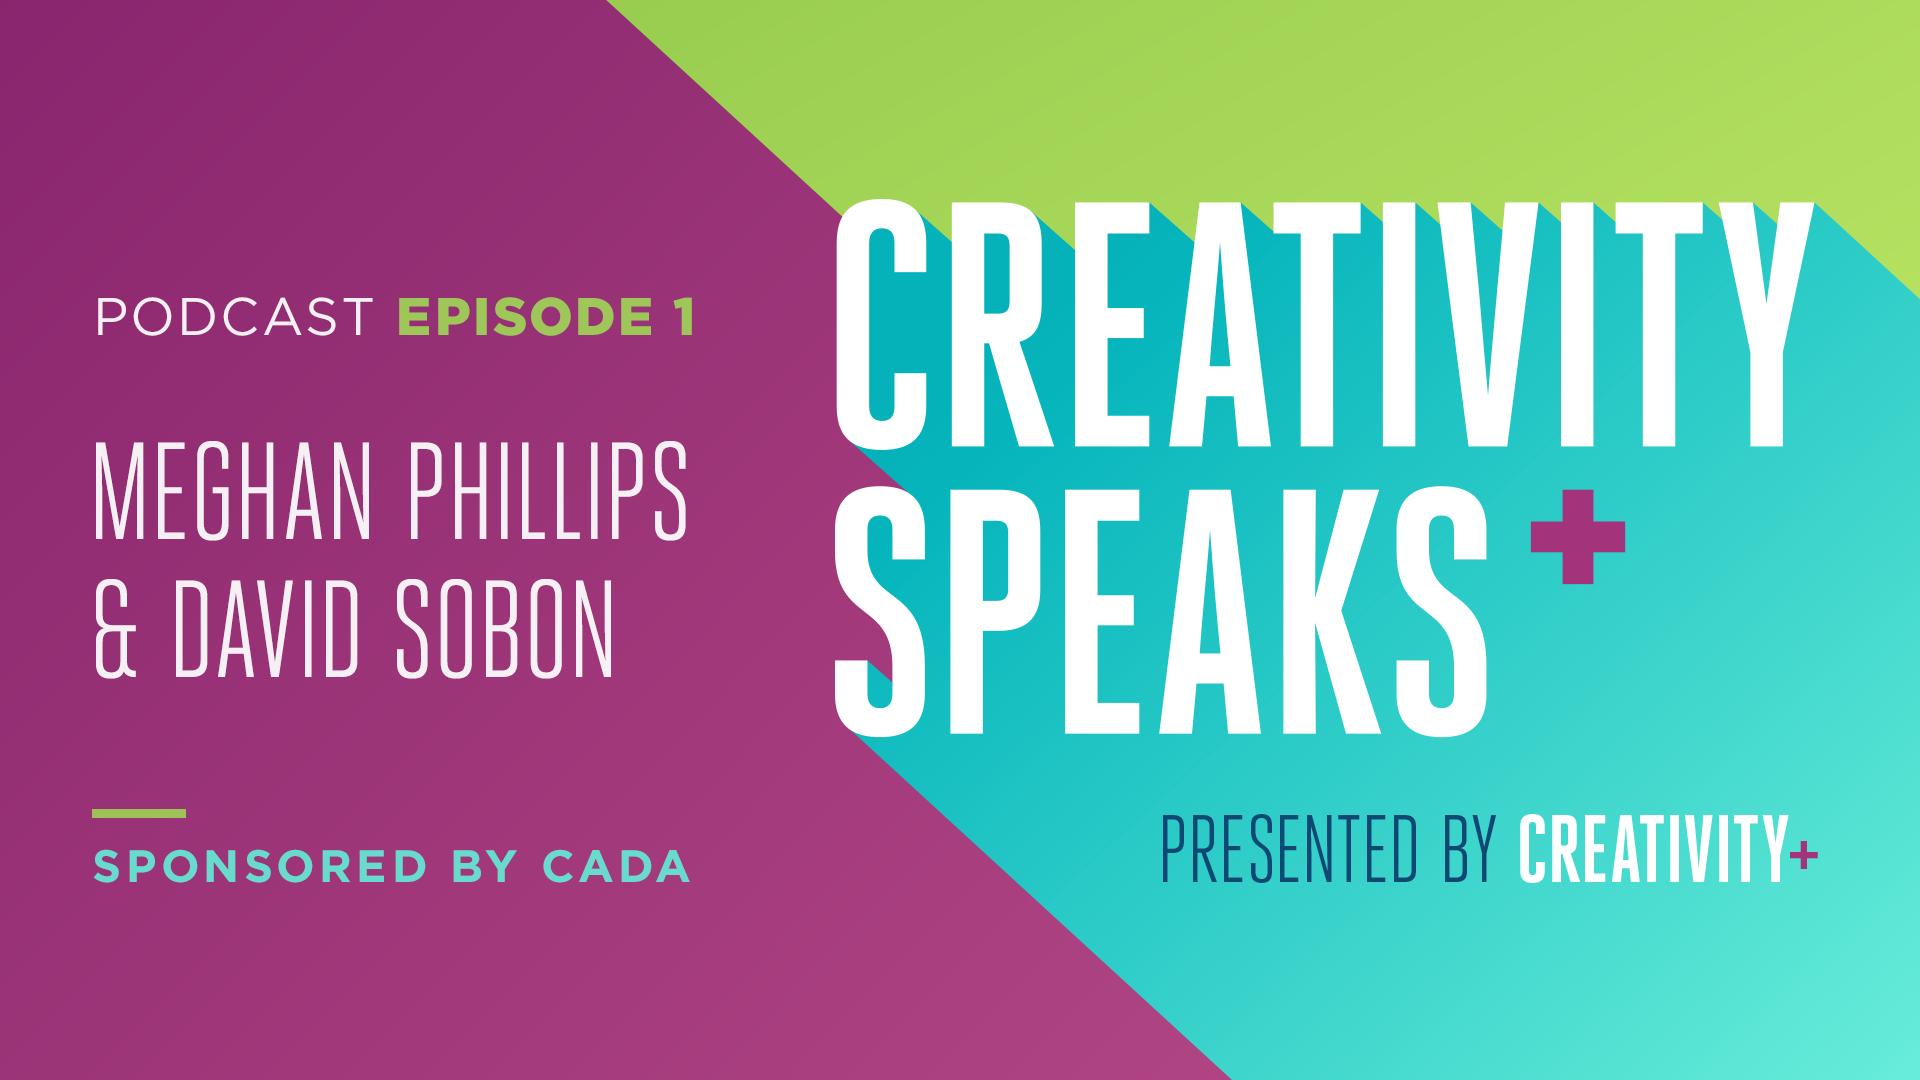 cs-podcast-episode1-fb (1).png